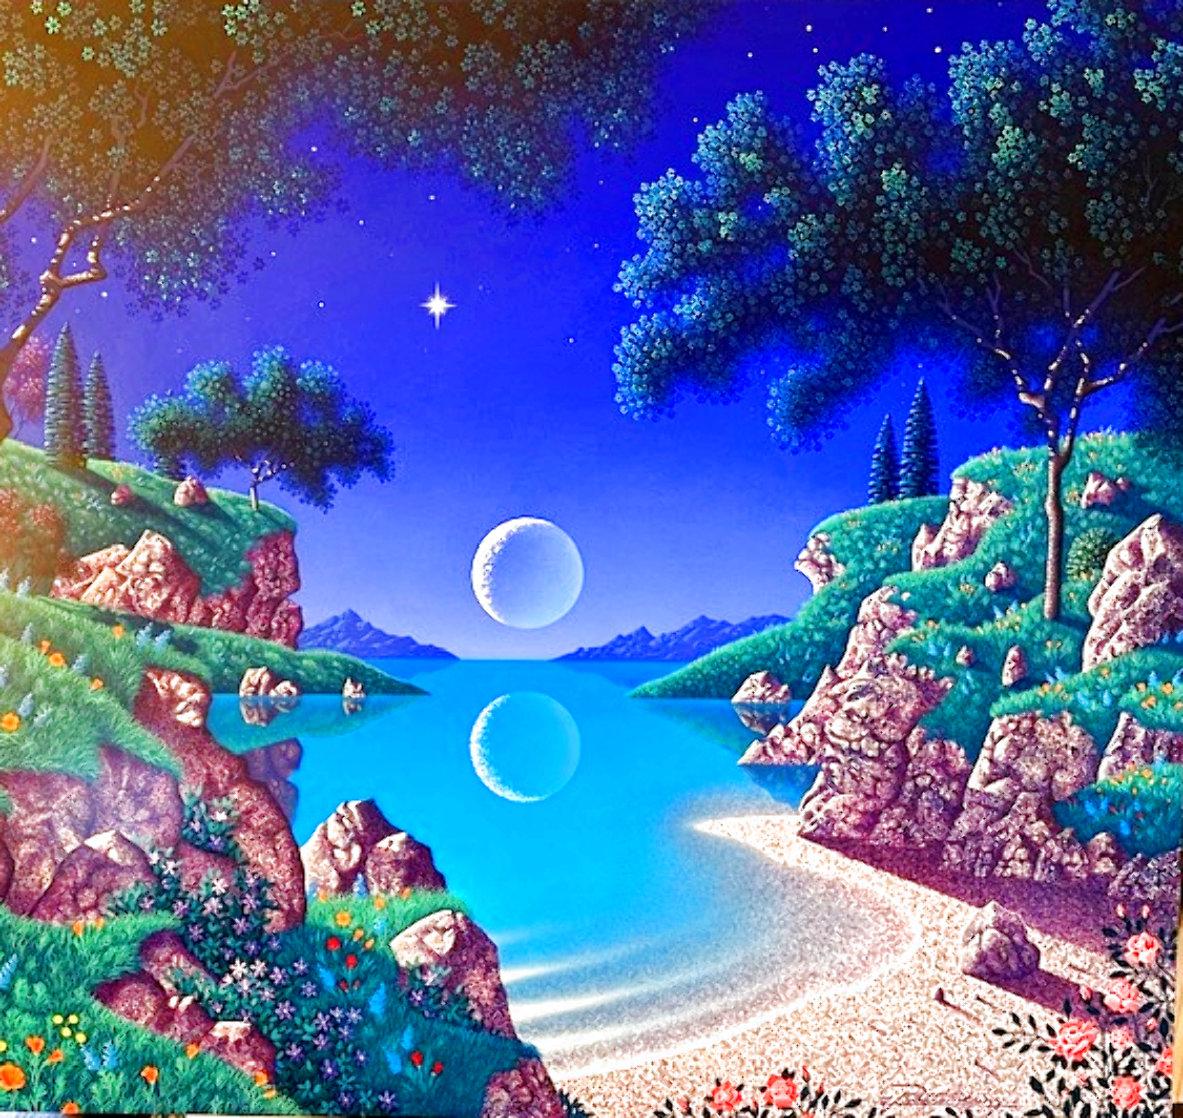 Bay of Dreams 1996 30x35  Original Painting by Jon Rattenbury